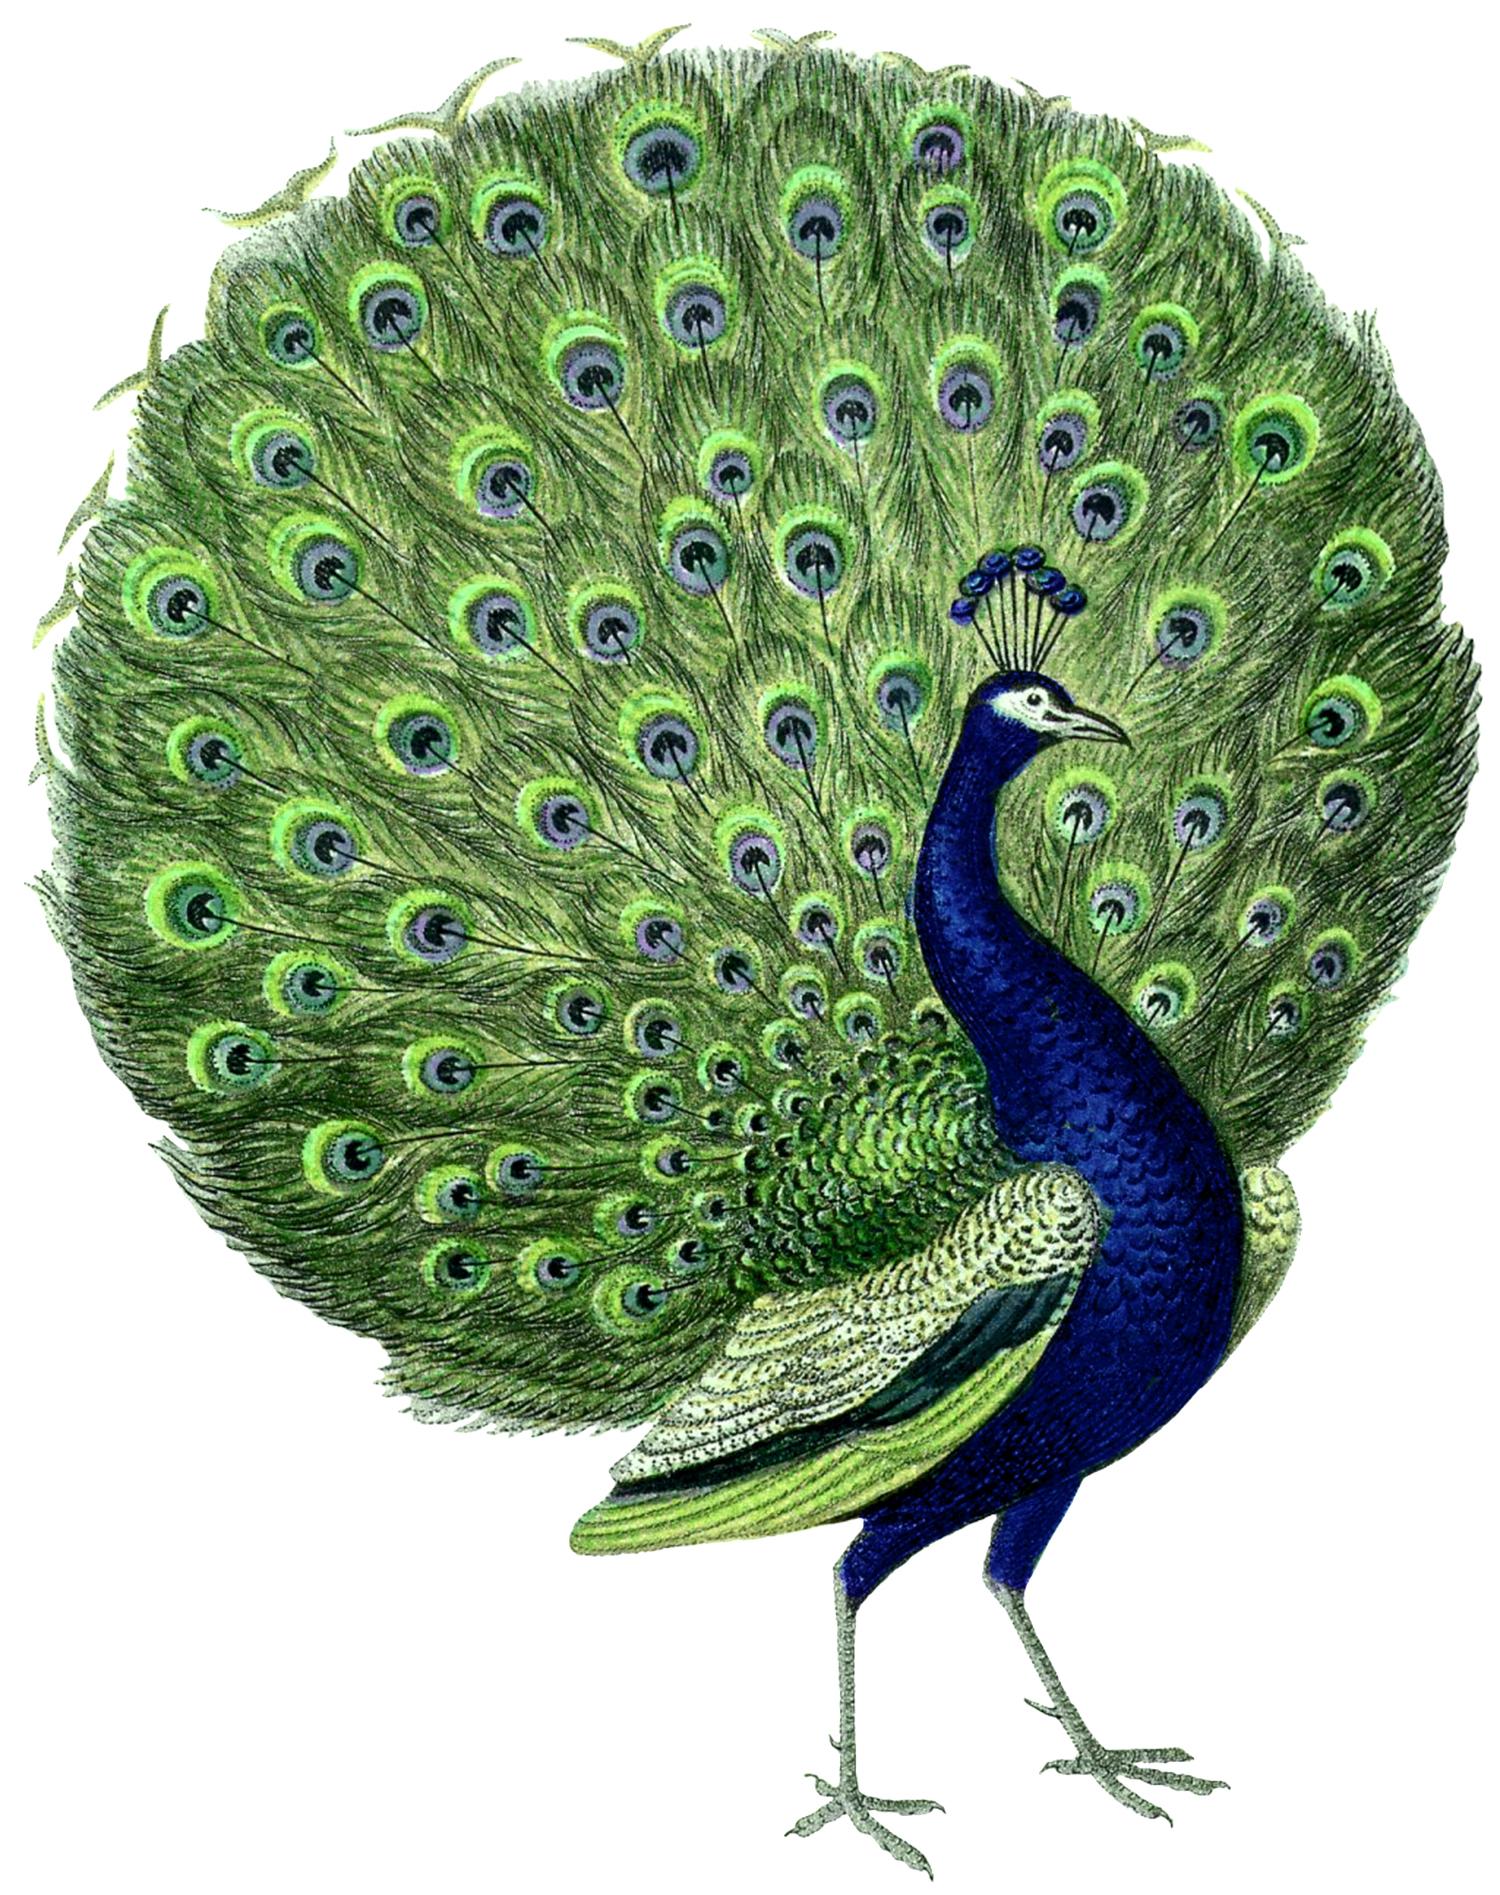 vintage-peacock-image-graphicsfairy2.jpg